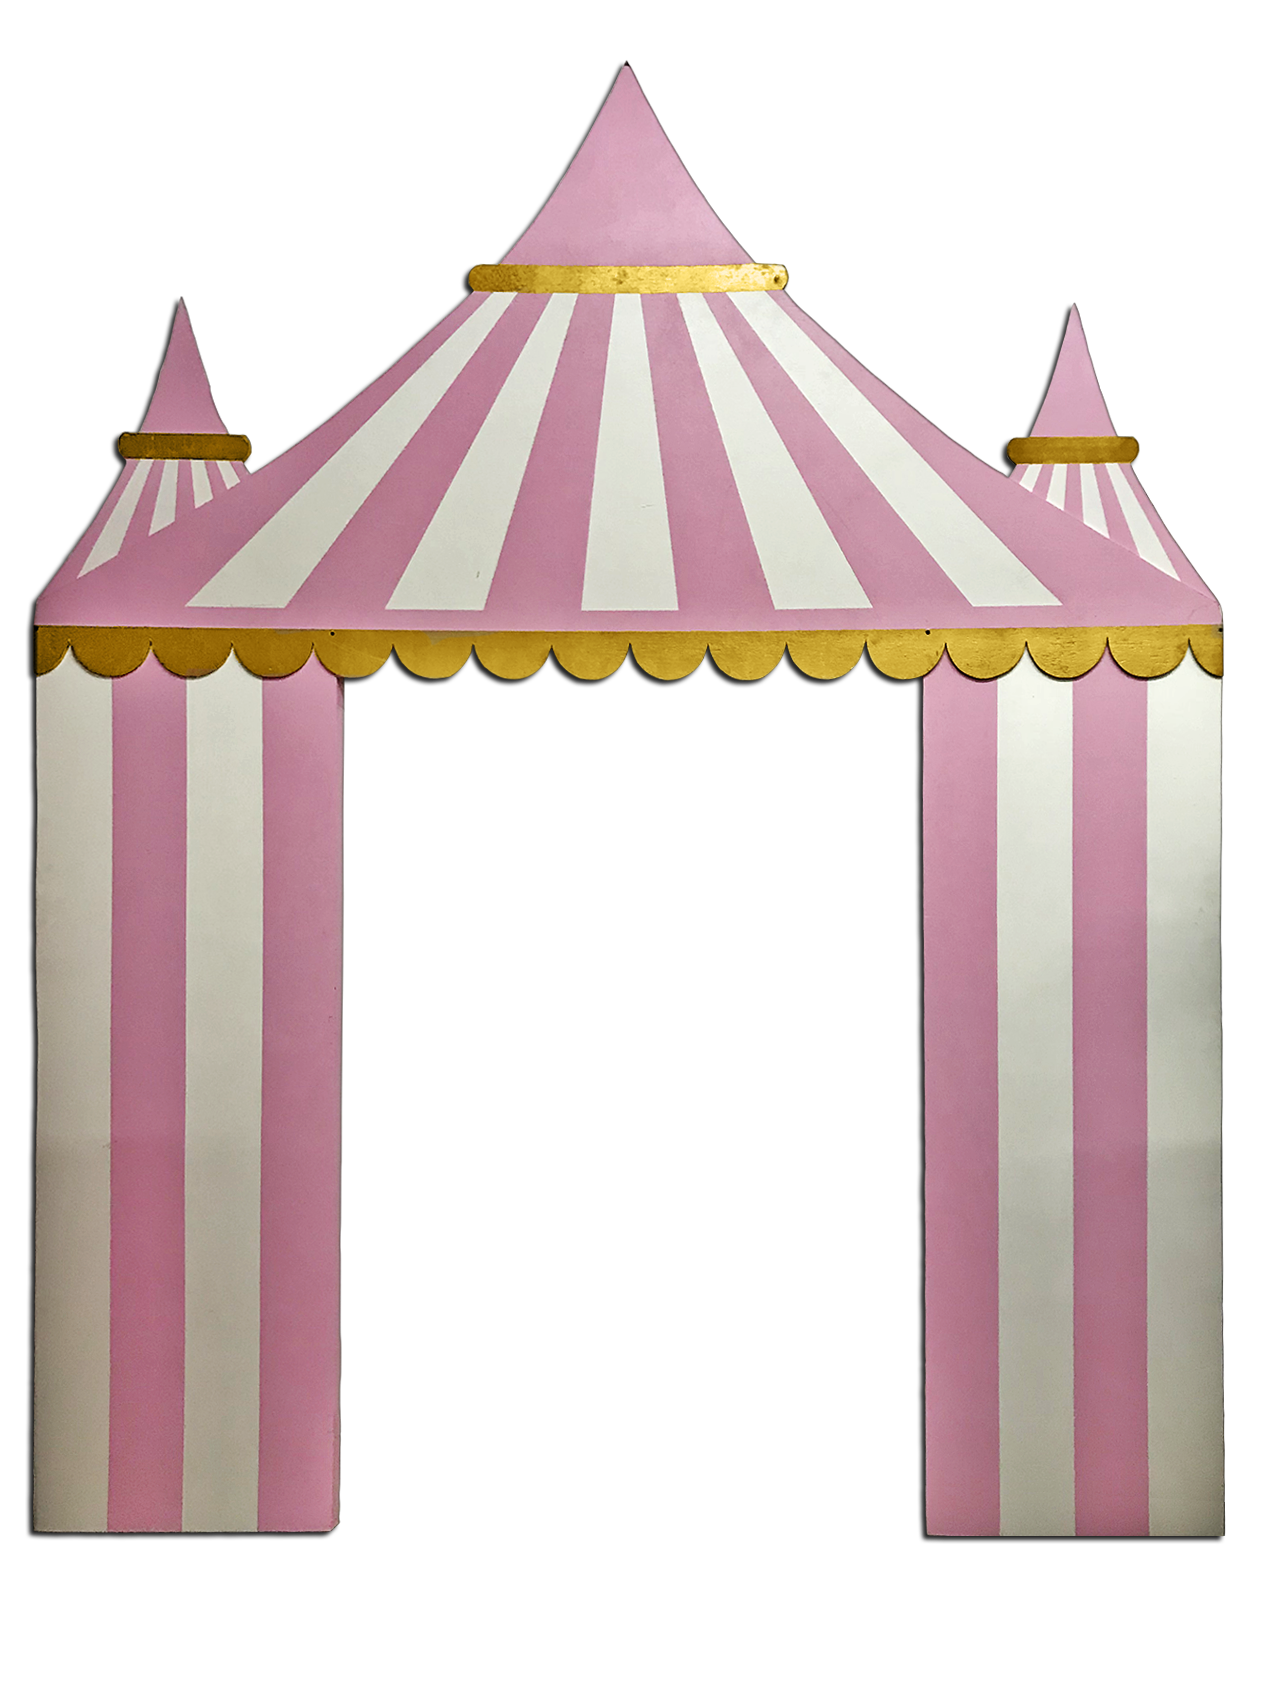 Carnival backdrop platinum prop. Carousel clipart tent circus pink